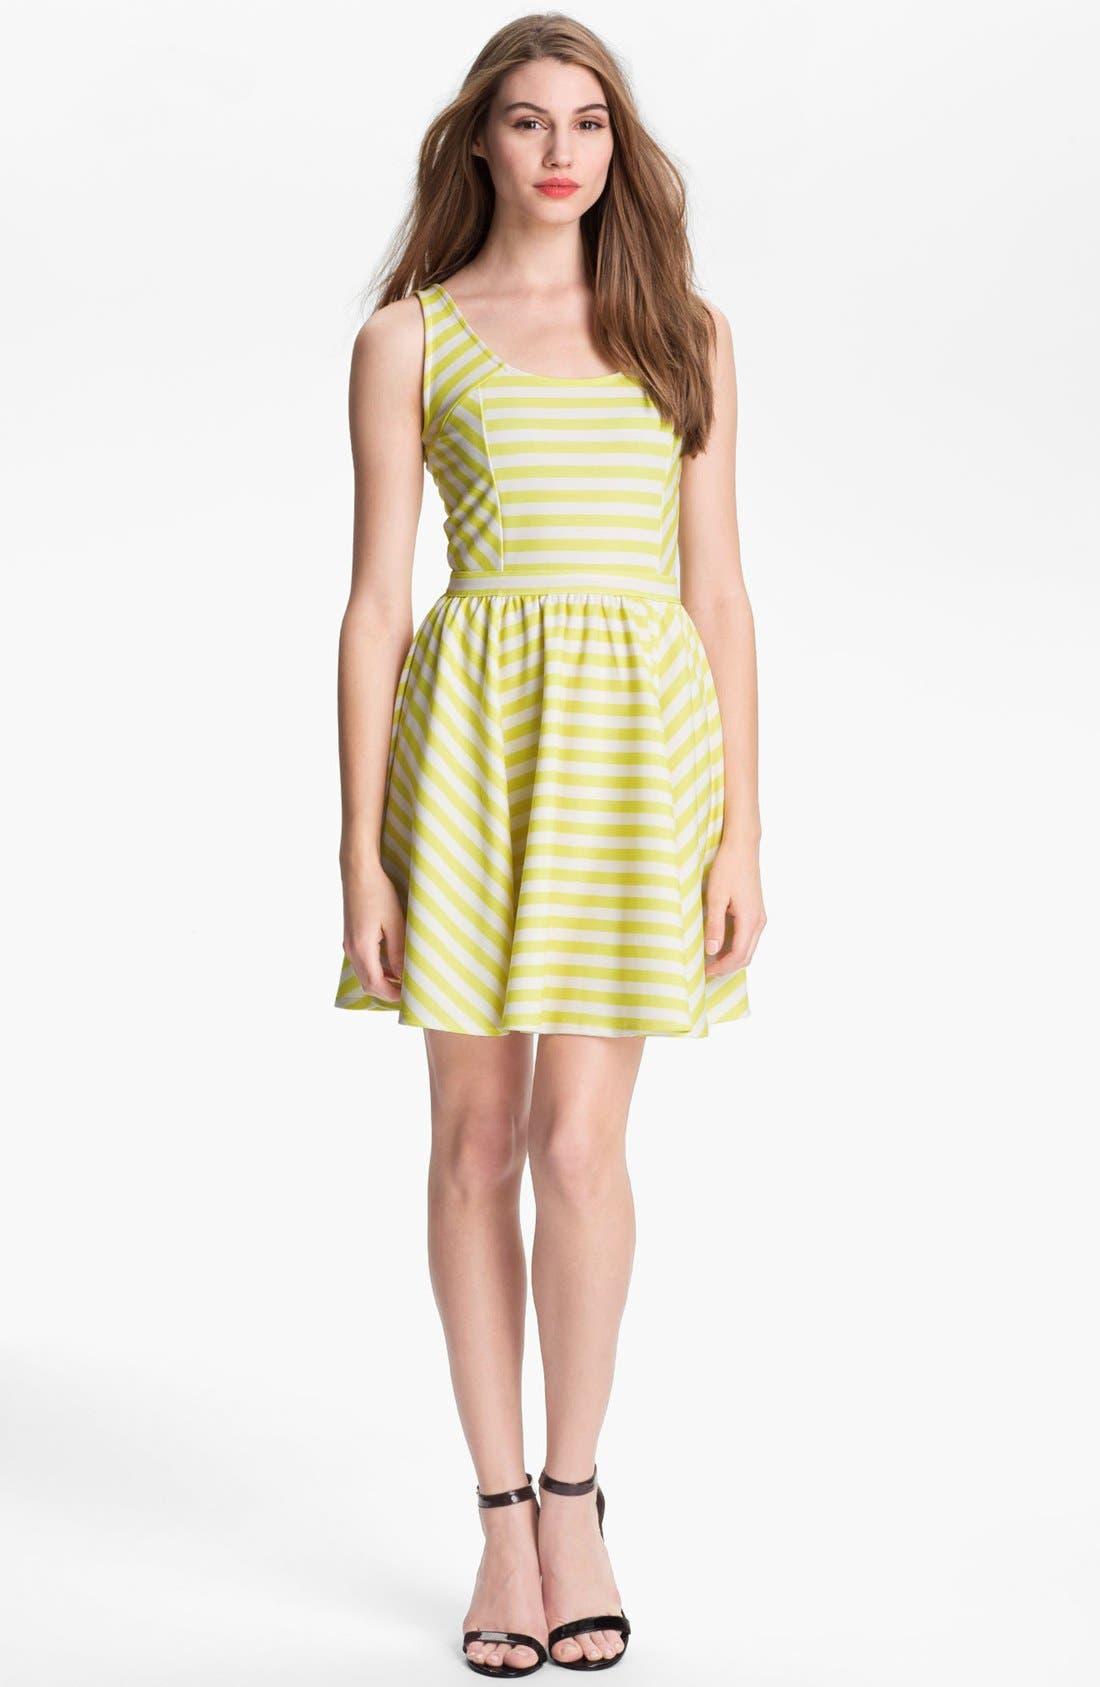 Alternate Image 1 Selected - Jessica Simpson 'Sharon' Stripe Dress